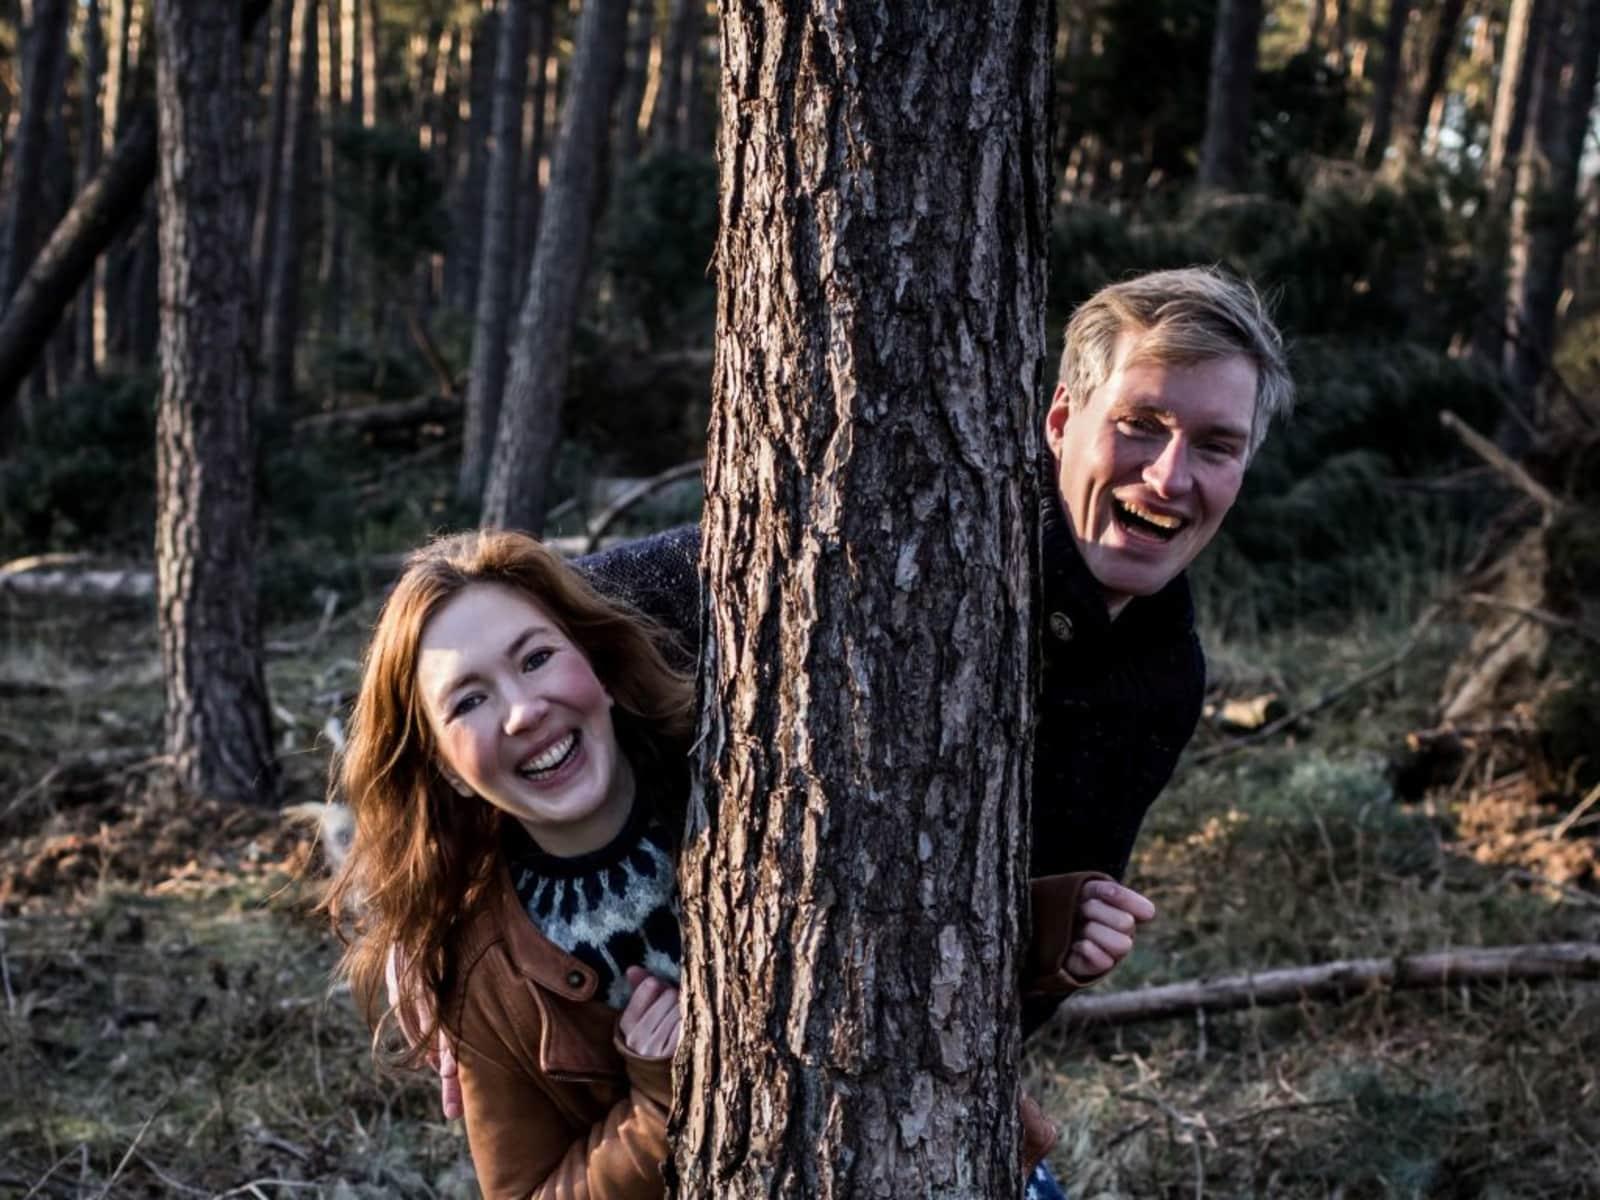 Laura & Bernd from Heiden, Germany